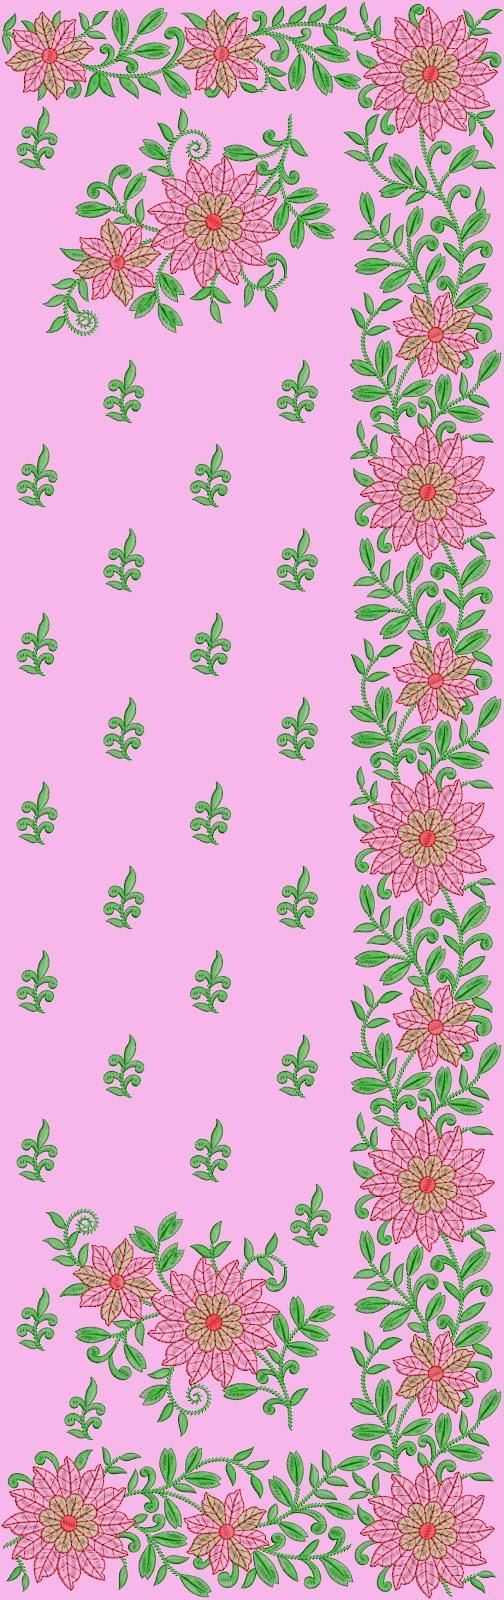 Hand Embroidery Saree Designs Michaelieclark